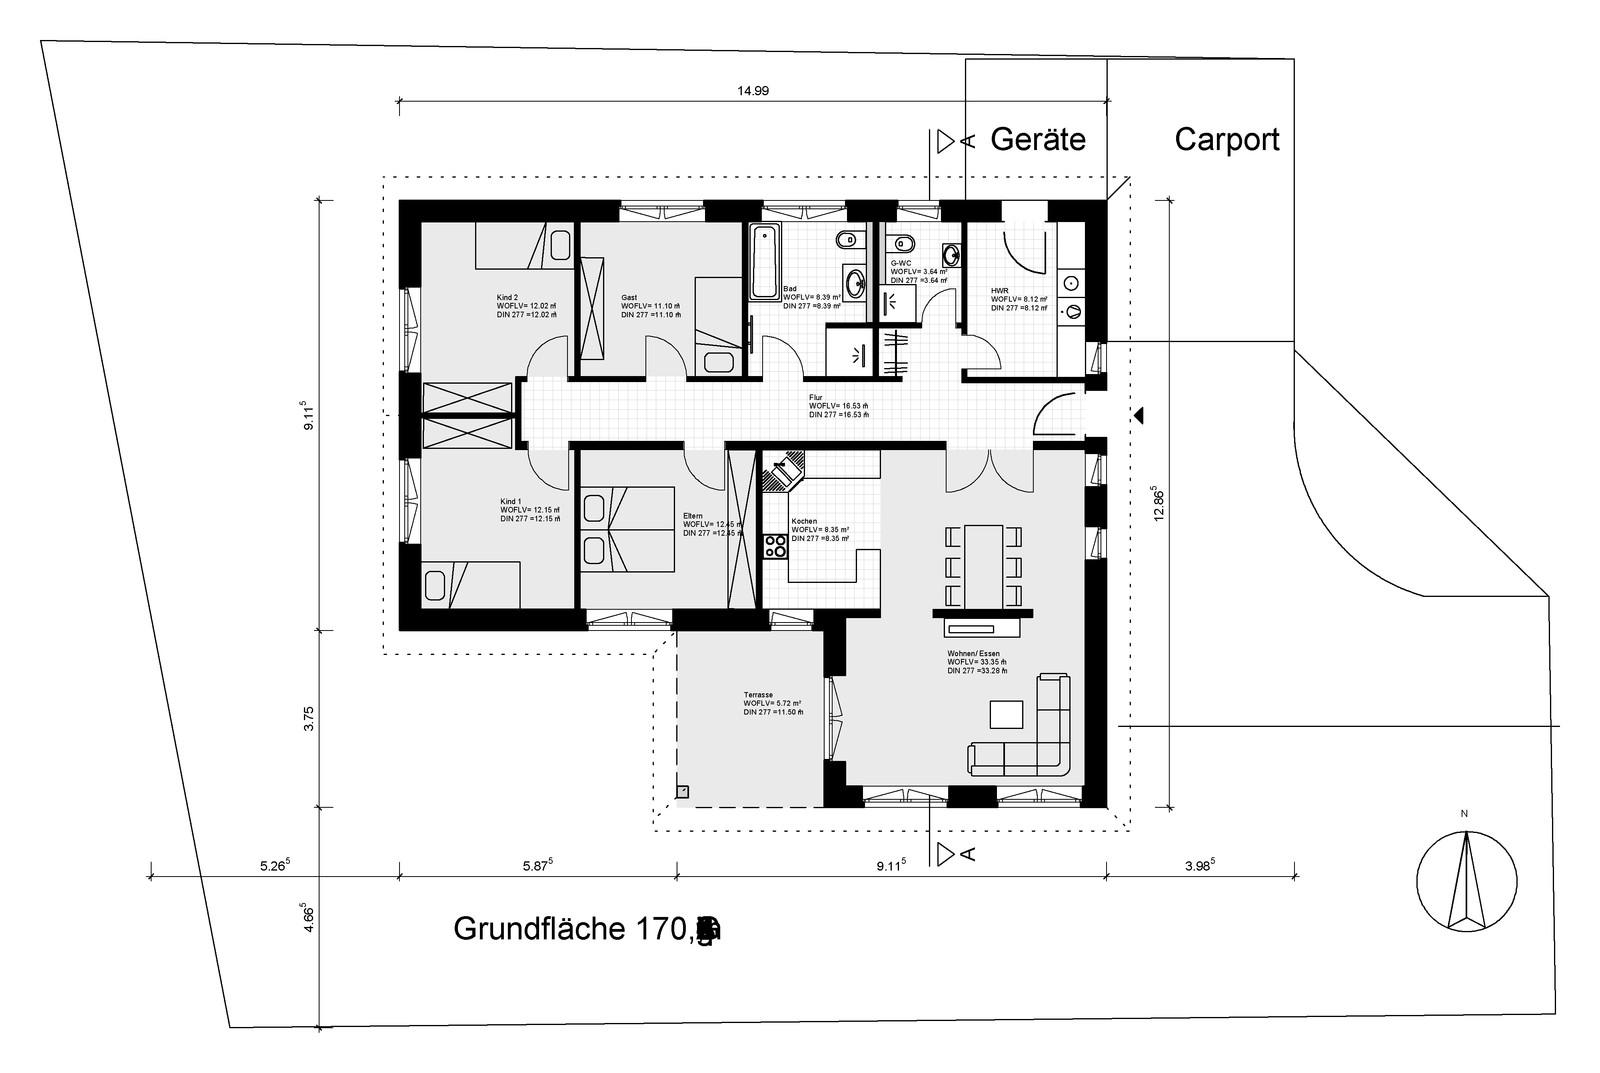 Bauberater.de | Bauberatung | Baubetreuung